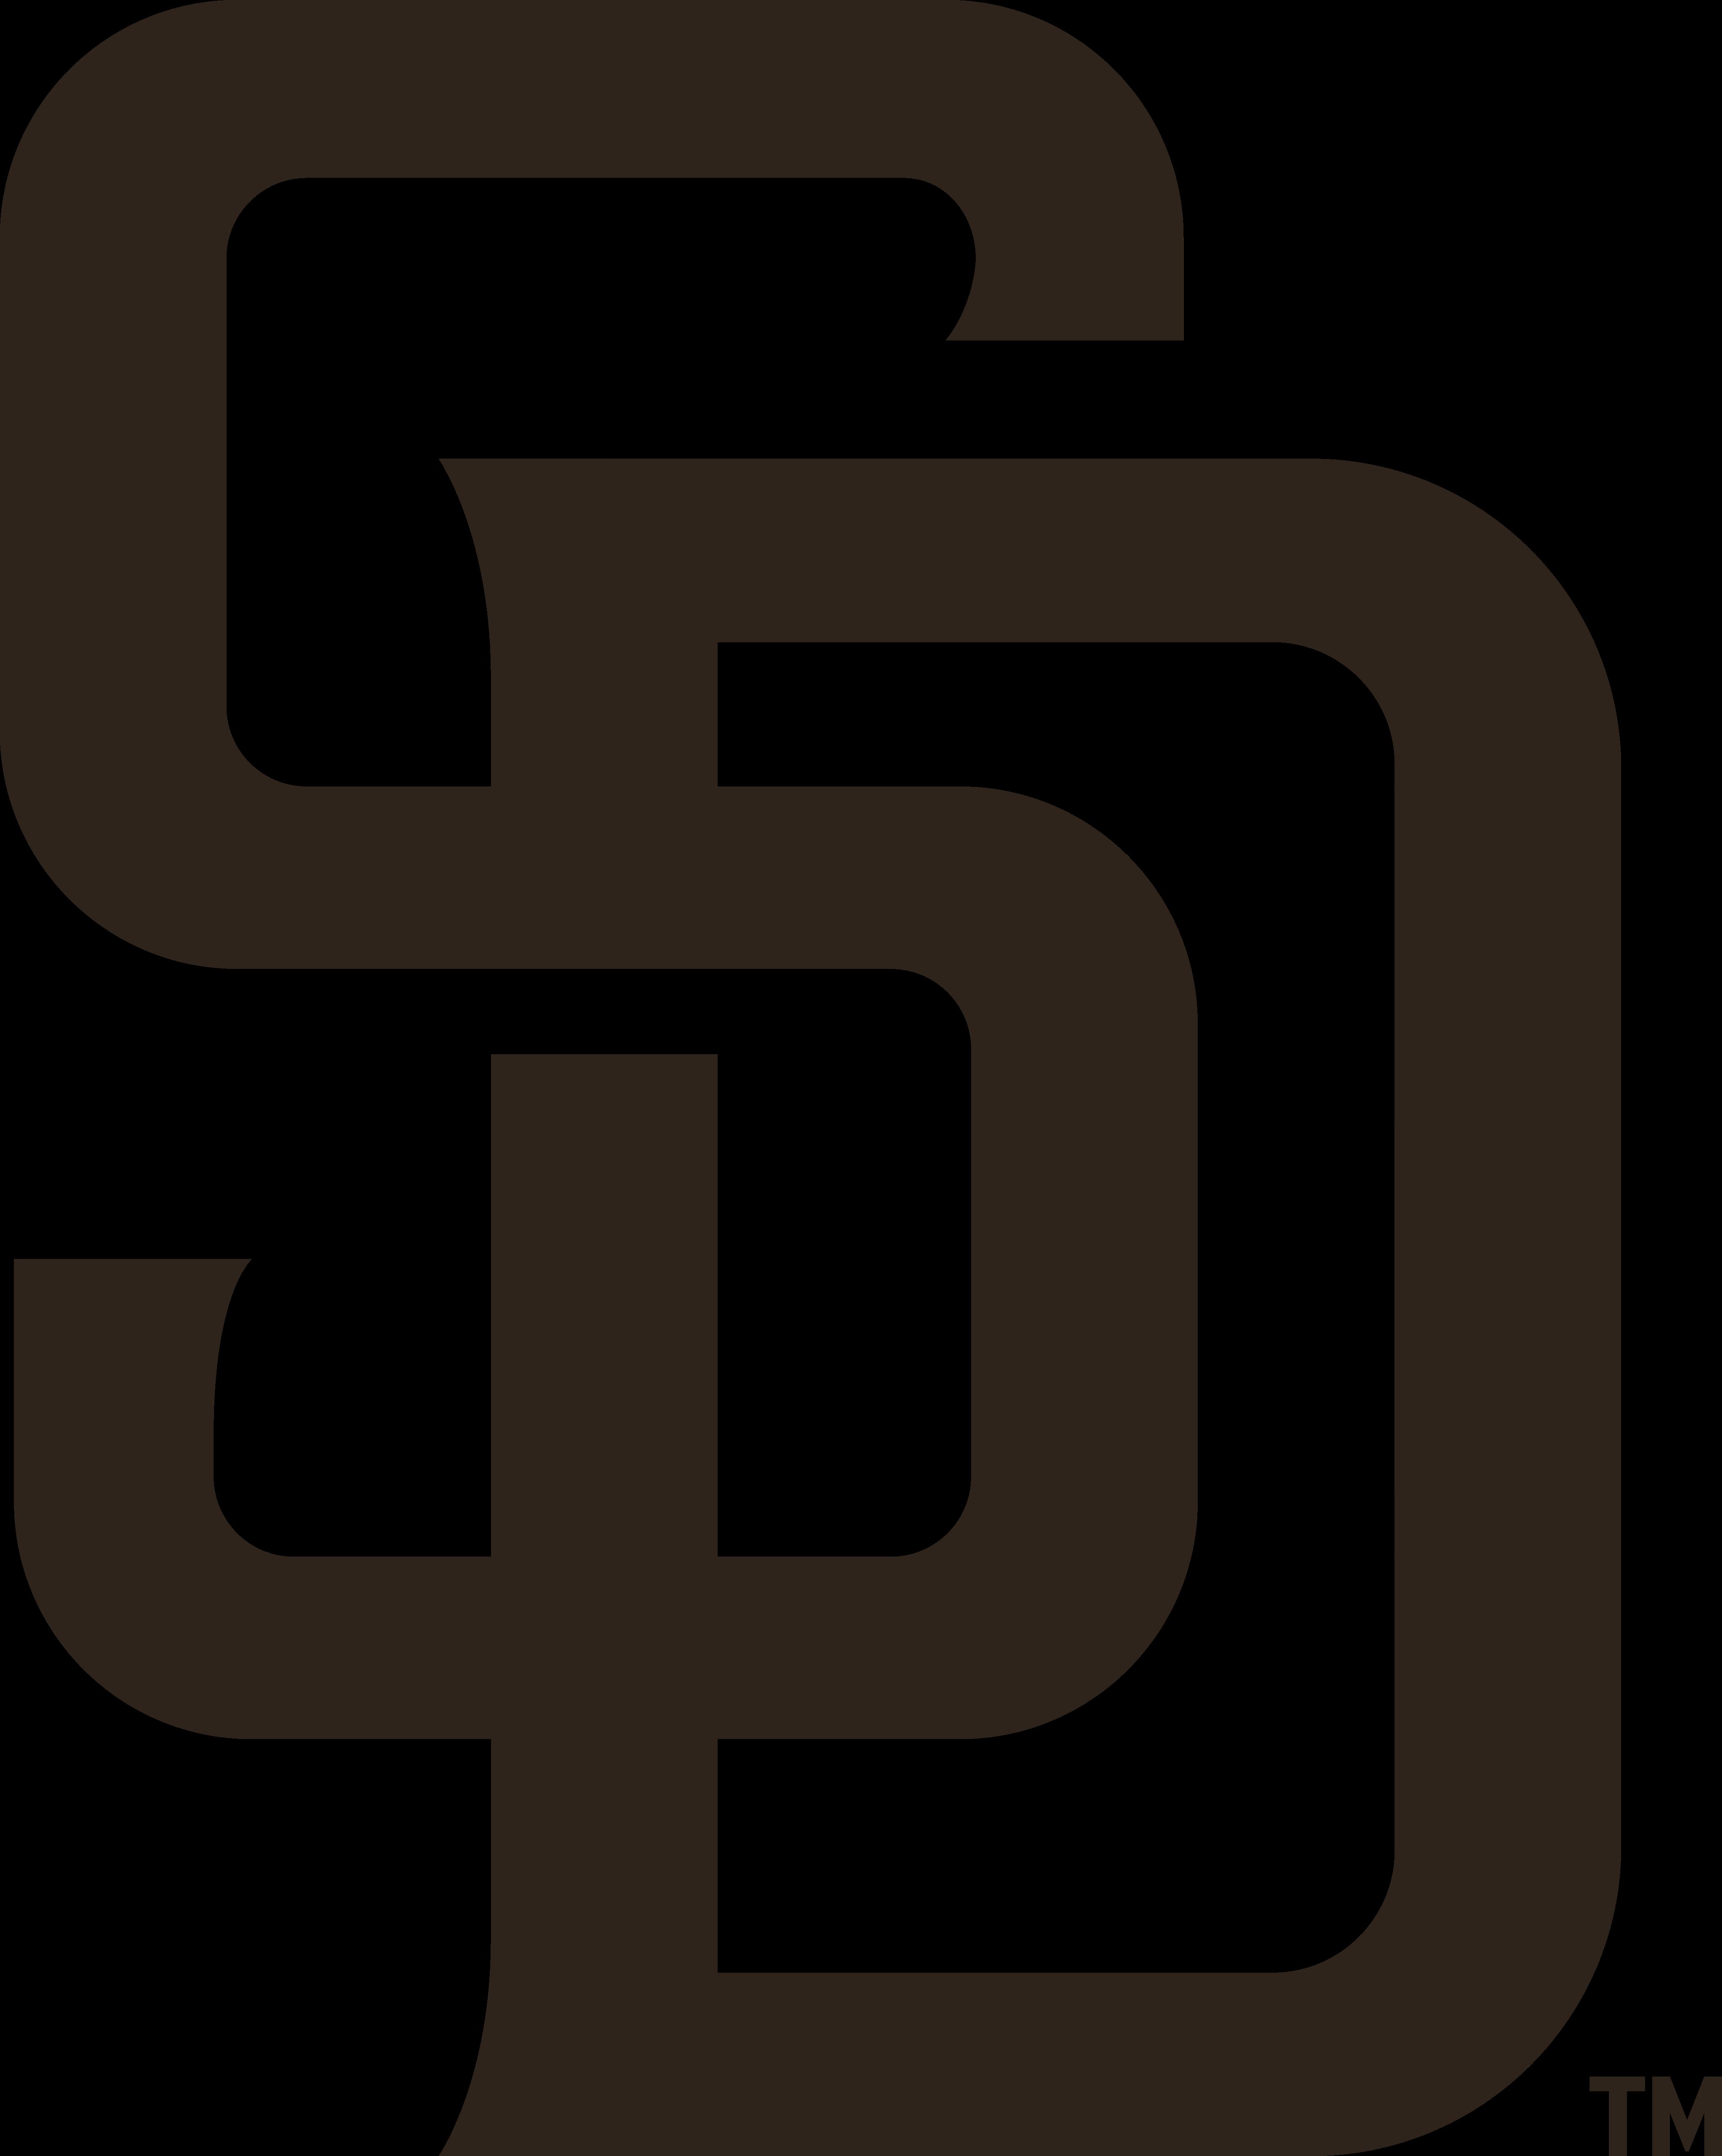 San Diego Padres Logo.